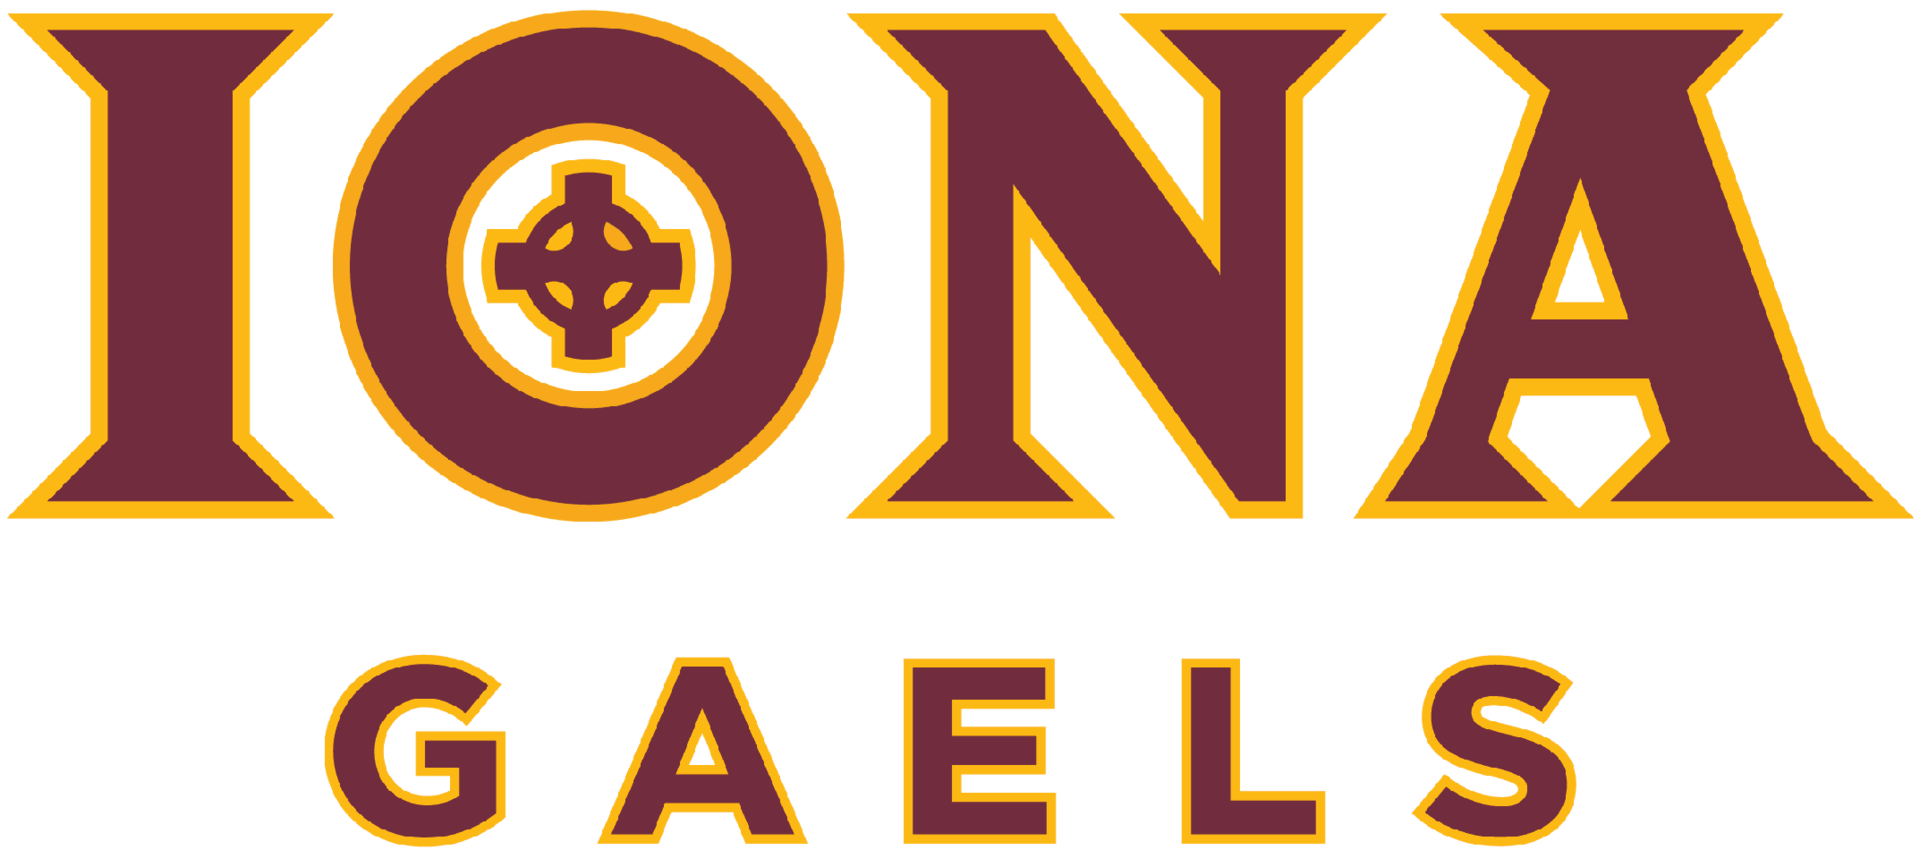 201415 Iona Gaels Mens Basketball Team Wikipedia